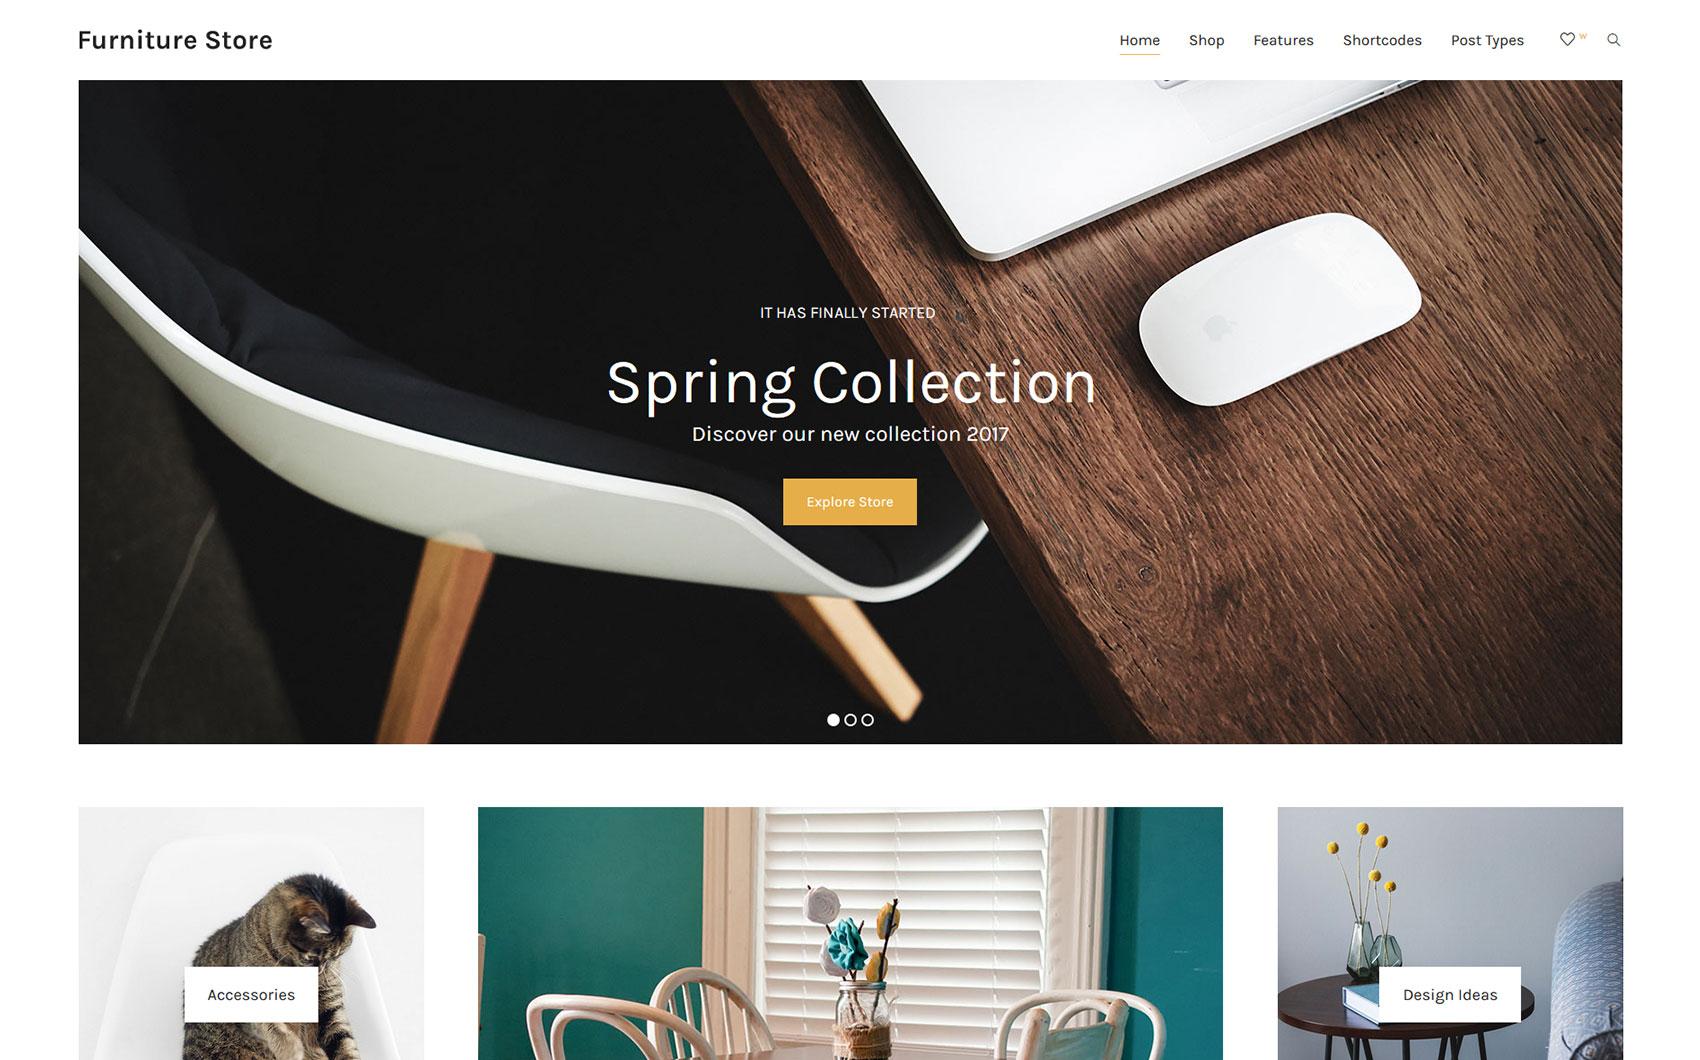 https://s3.tmimgcdn.com/templates/105/scr/furniture-store-slider-3.jpg